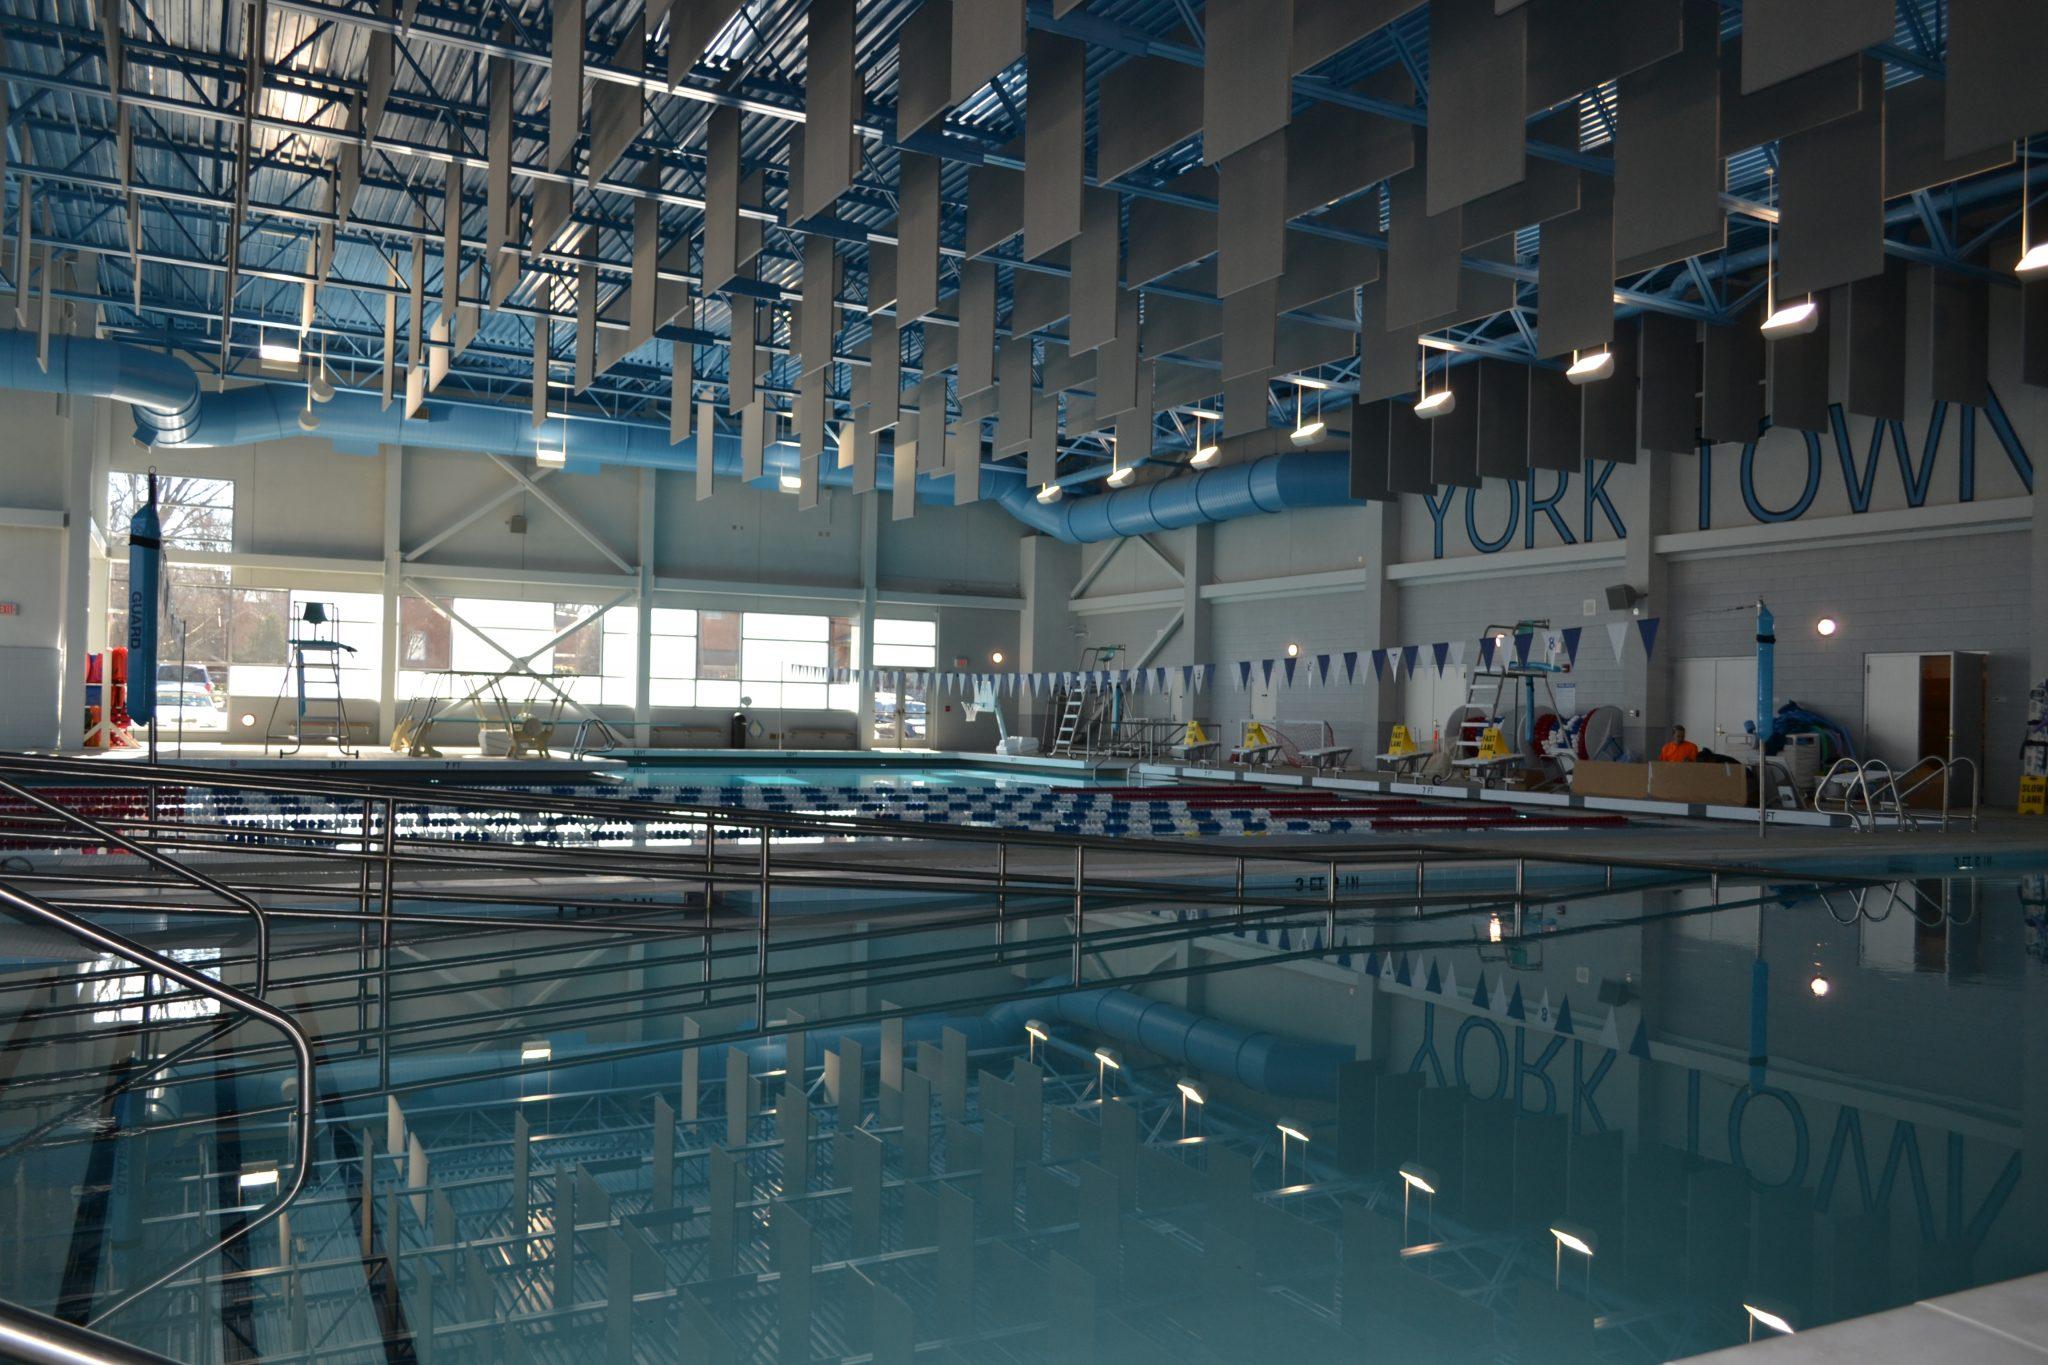 Yorktown High School Main Line Commercial Pools